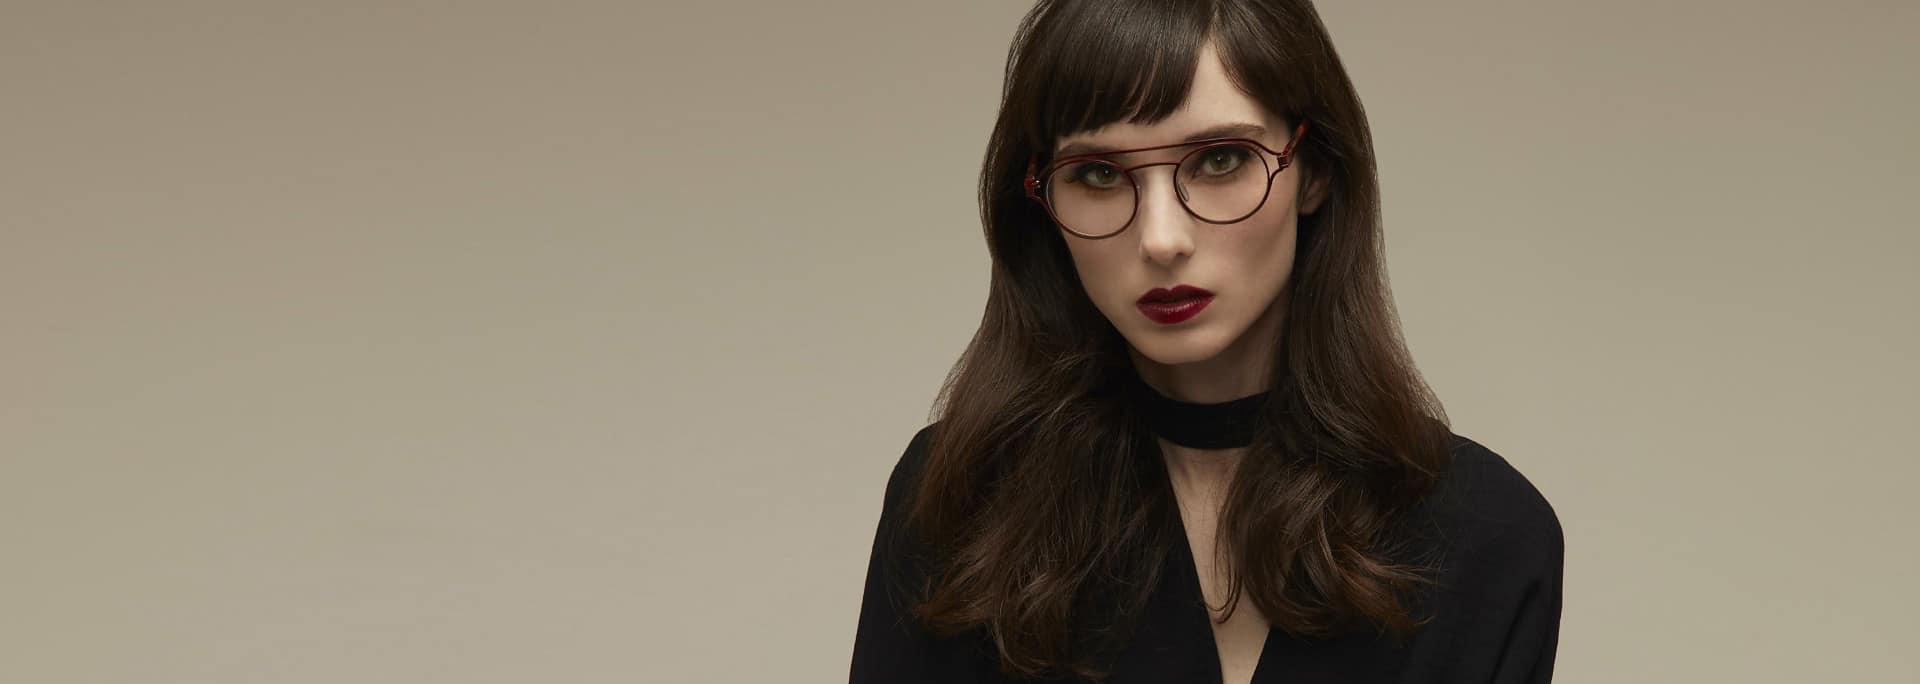 Lynn Valley Optometry sells Eyeglass Frames